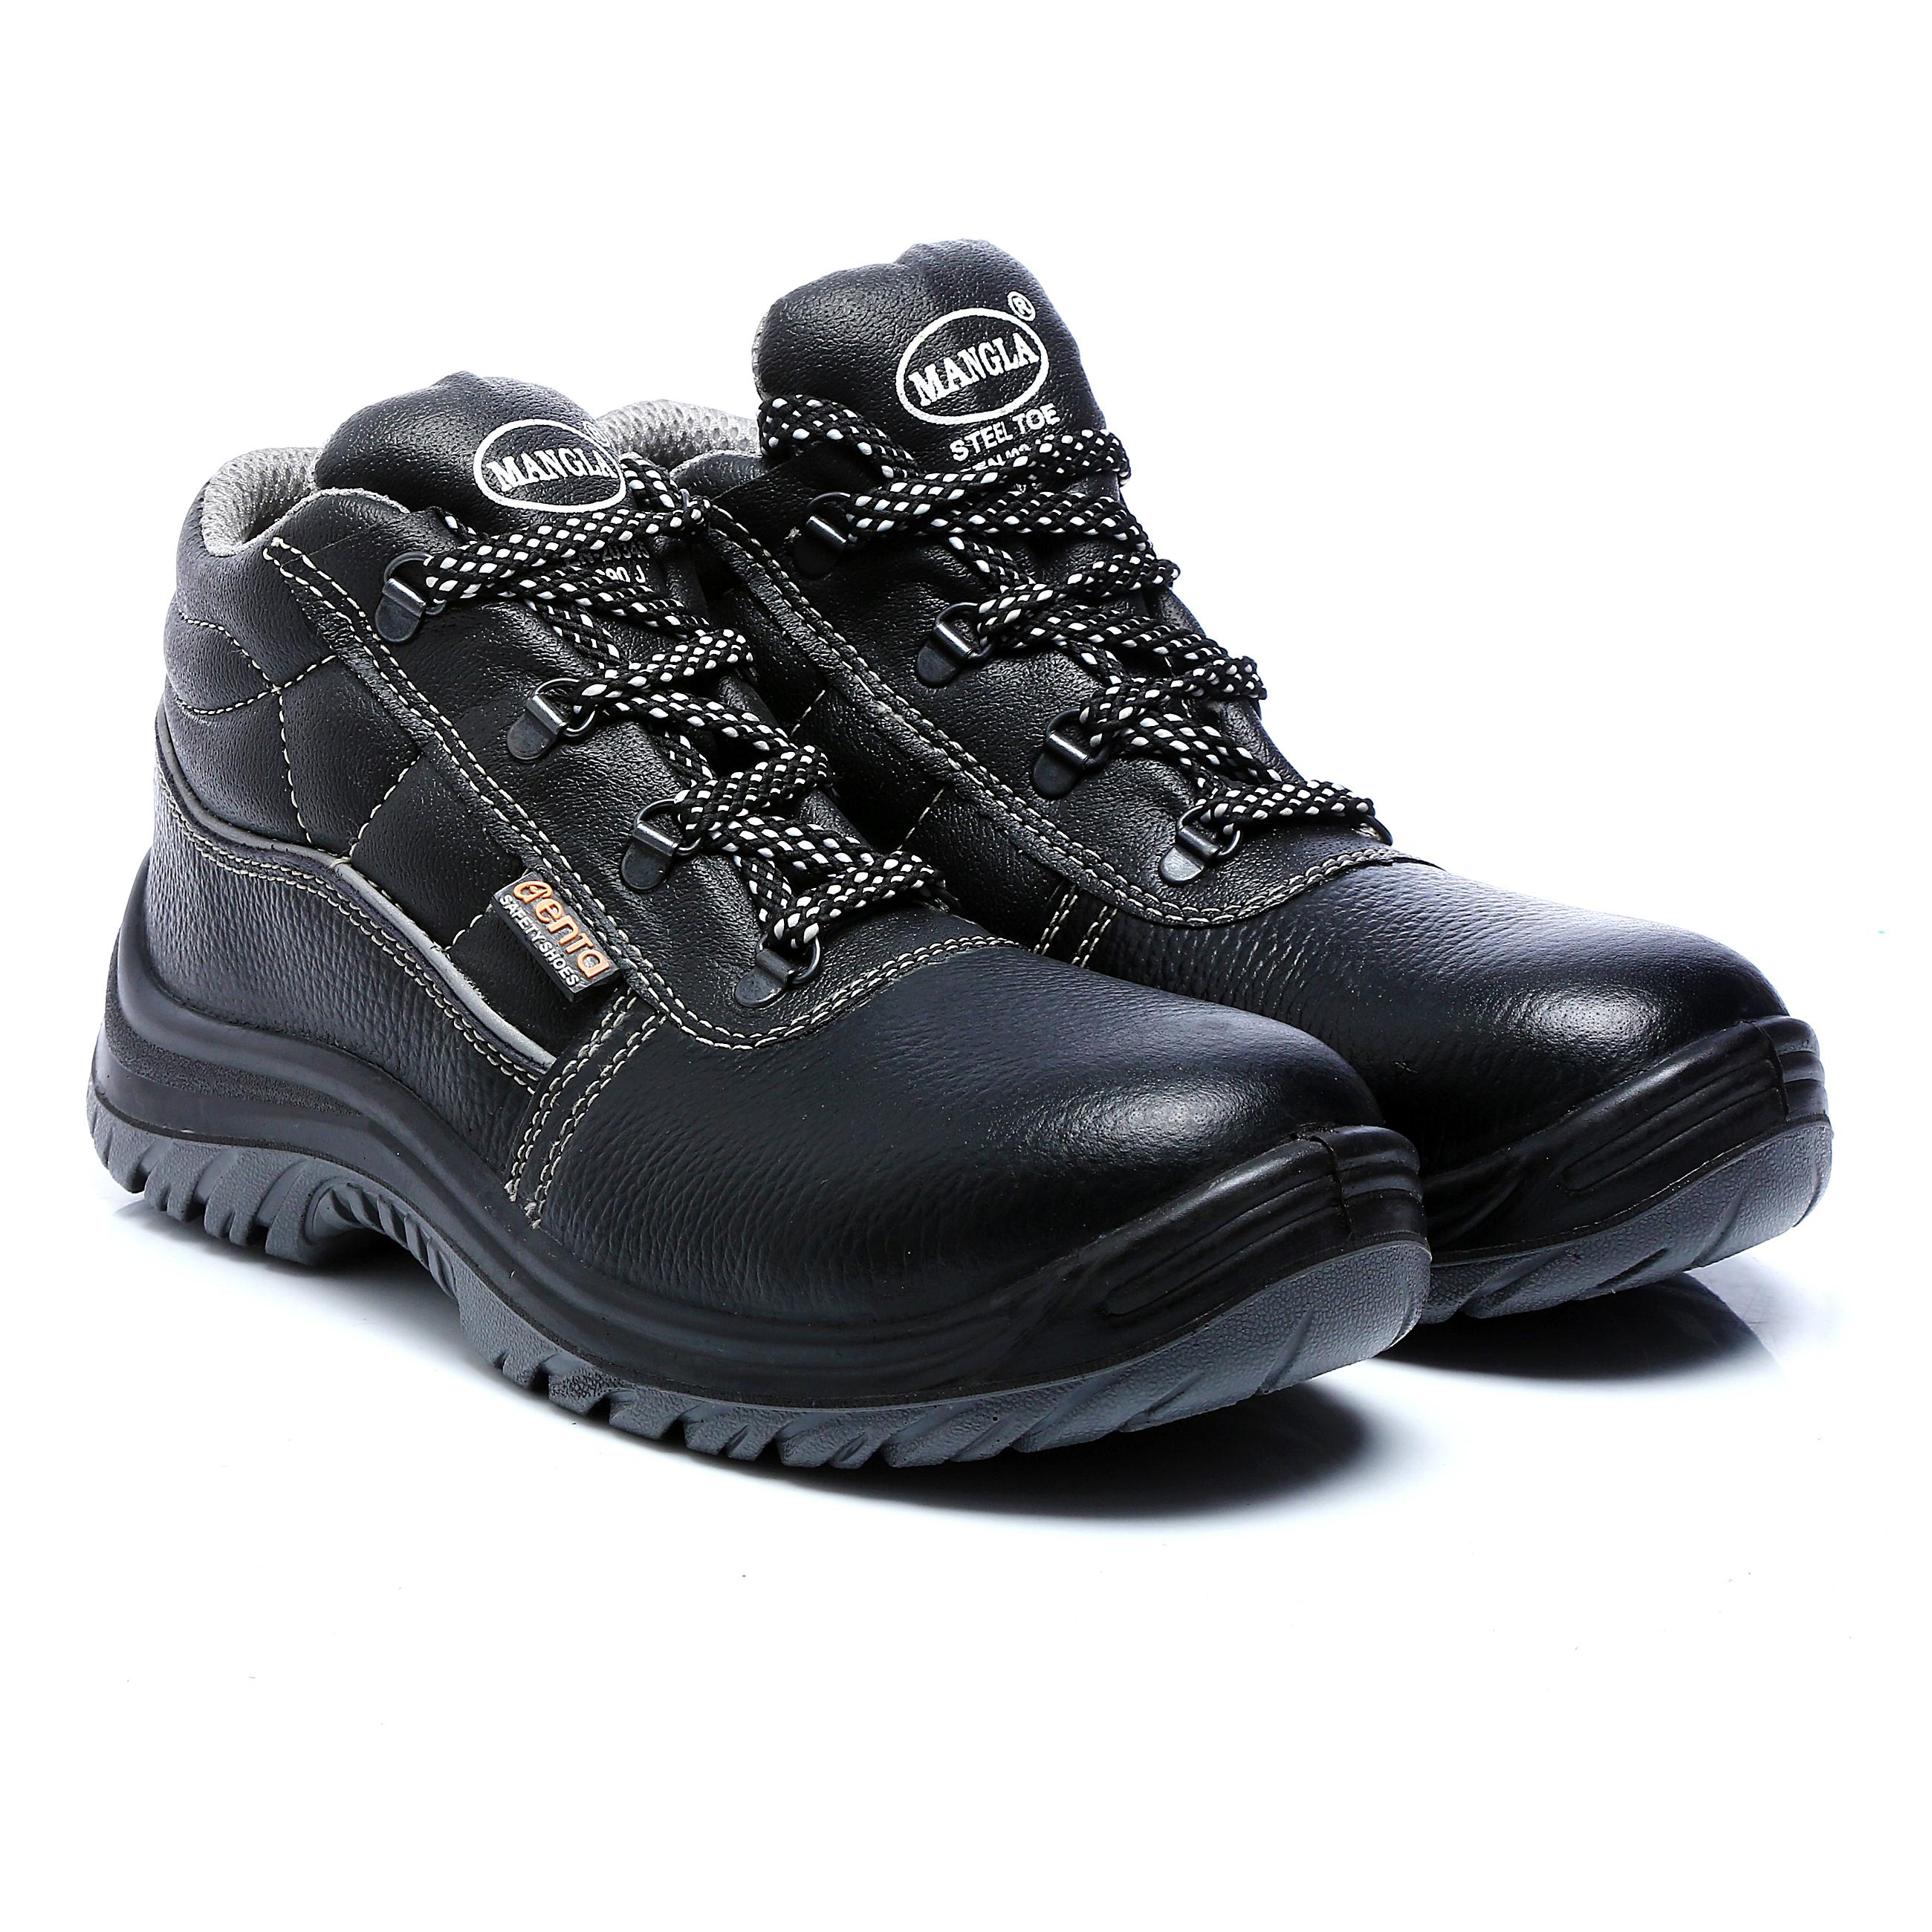 Plastic Toe Cap Safety Shoes